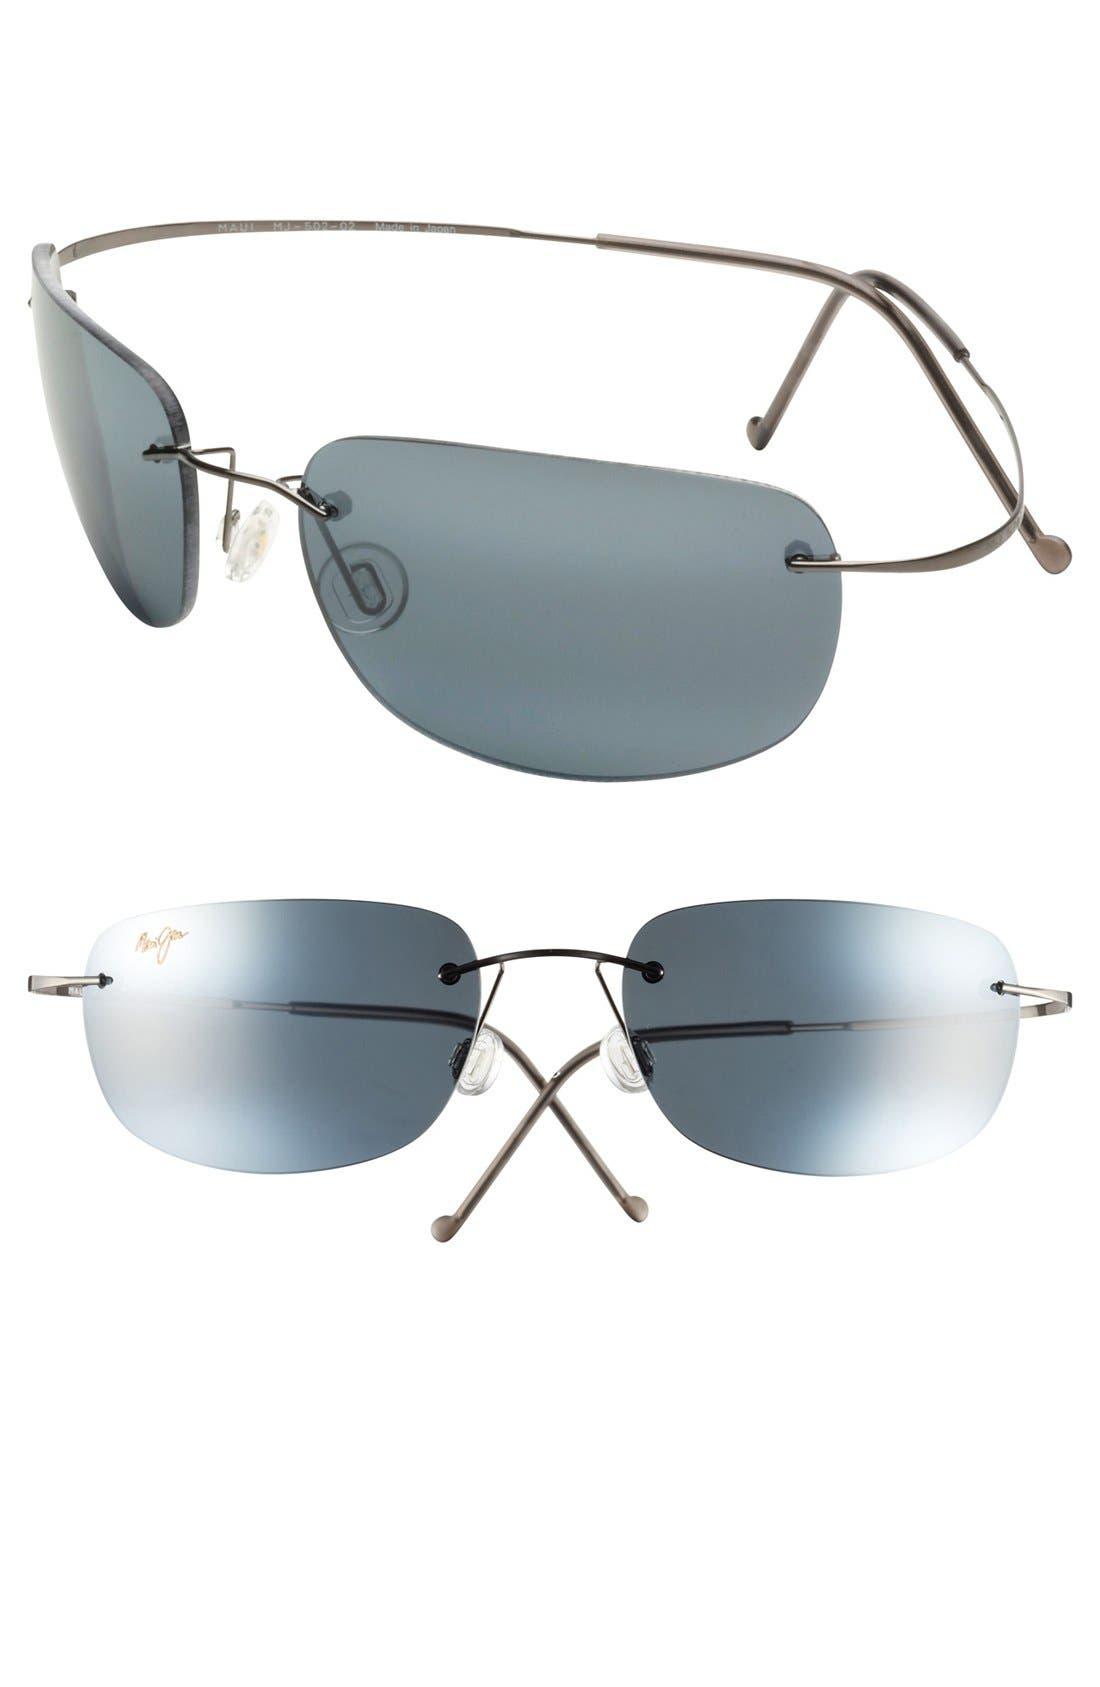 Main Image - Maui Jim Kapalua 57mm PolarizedPlus2® Hingeless Sunglasses